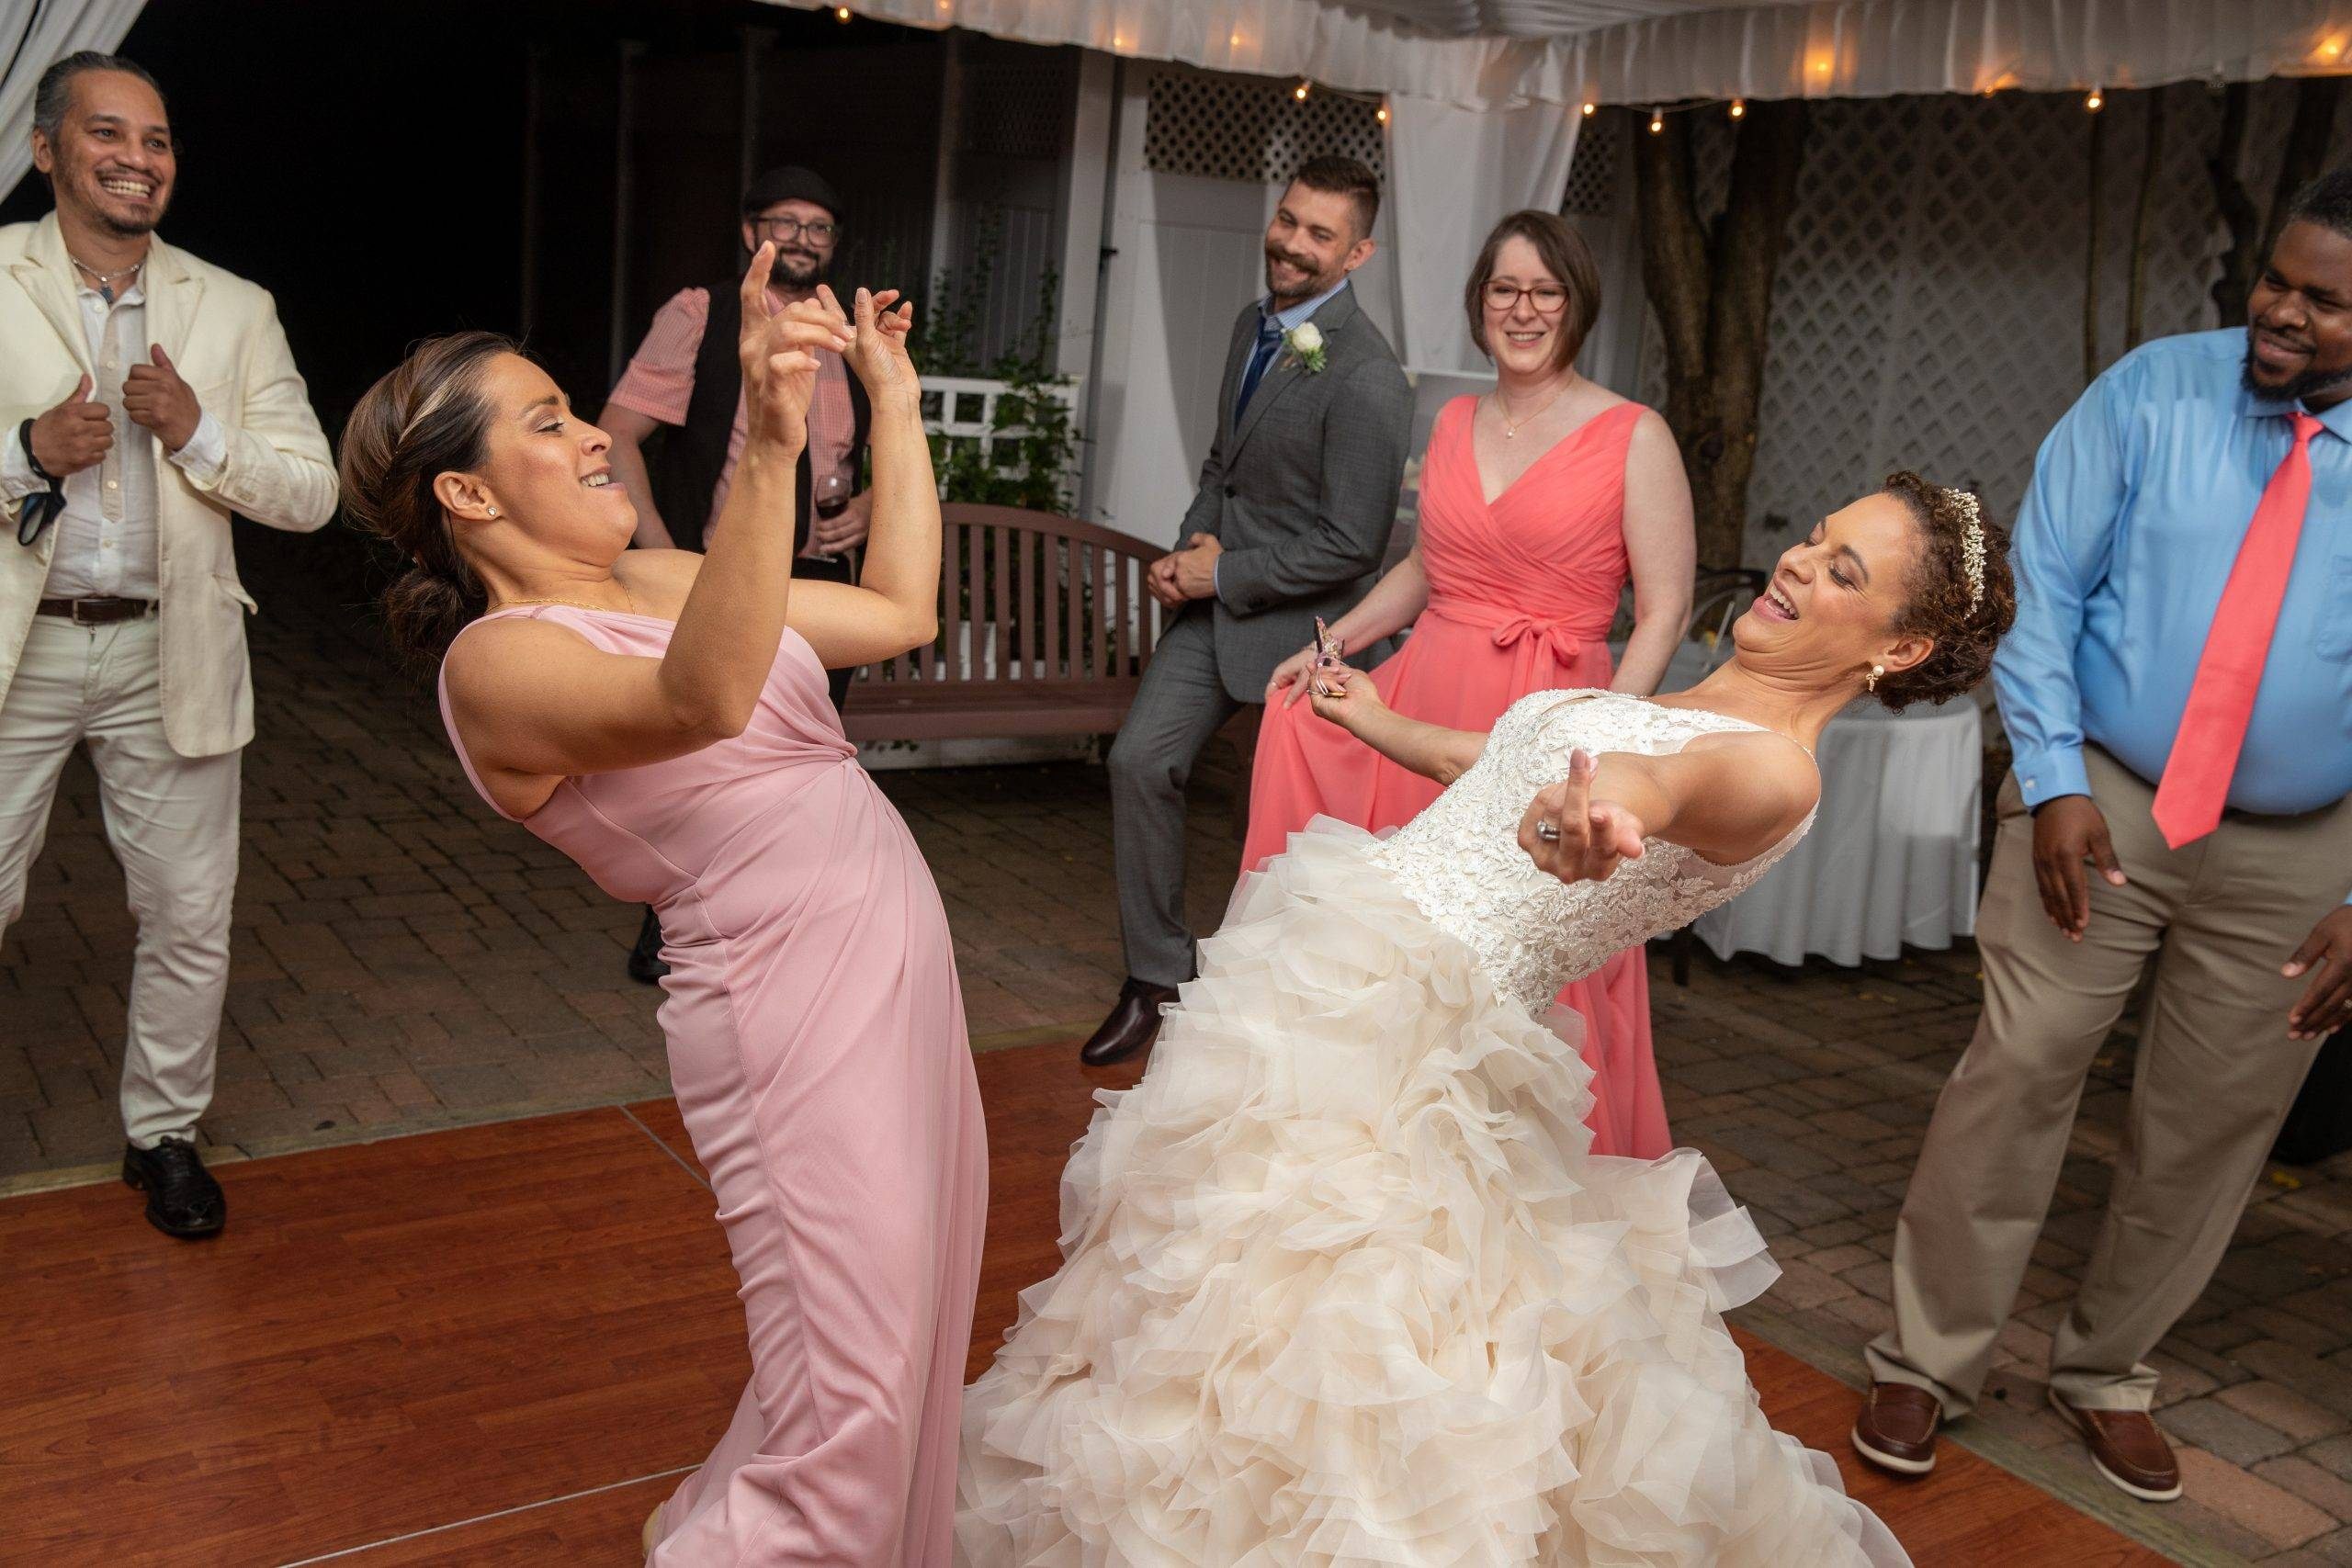 Olde Mill Inn bride dancing with bridesmaid